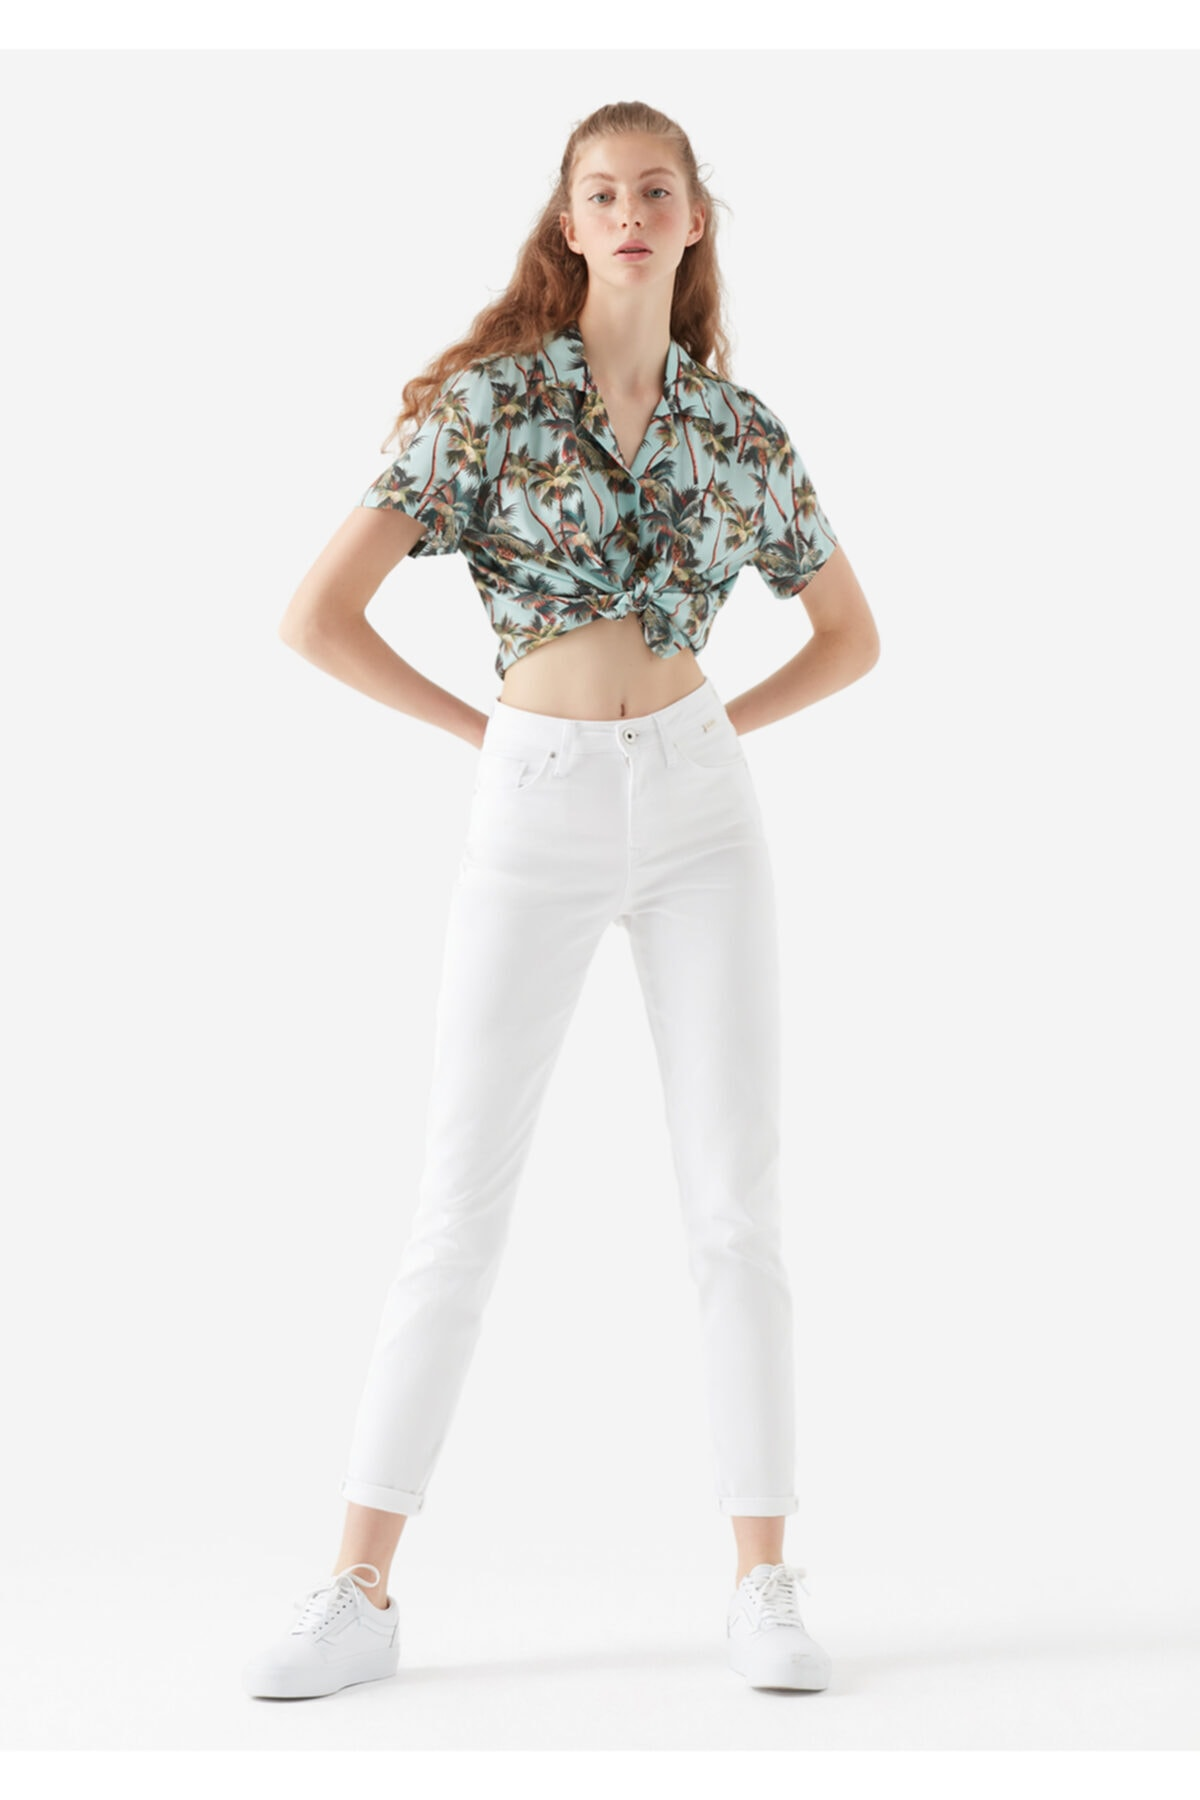 Kadın Cindy Gold Icon Beyaz Jean Pantolon 100277-31327